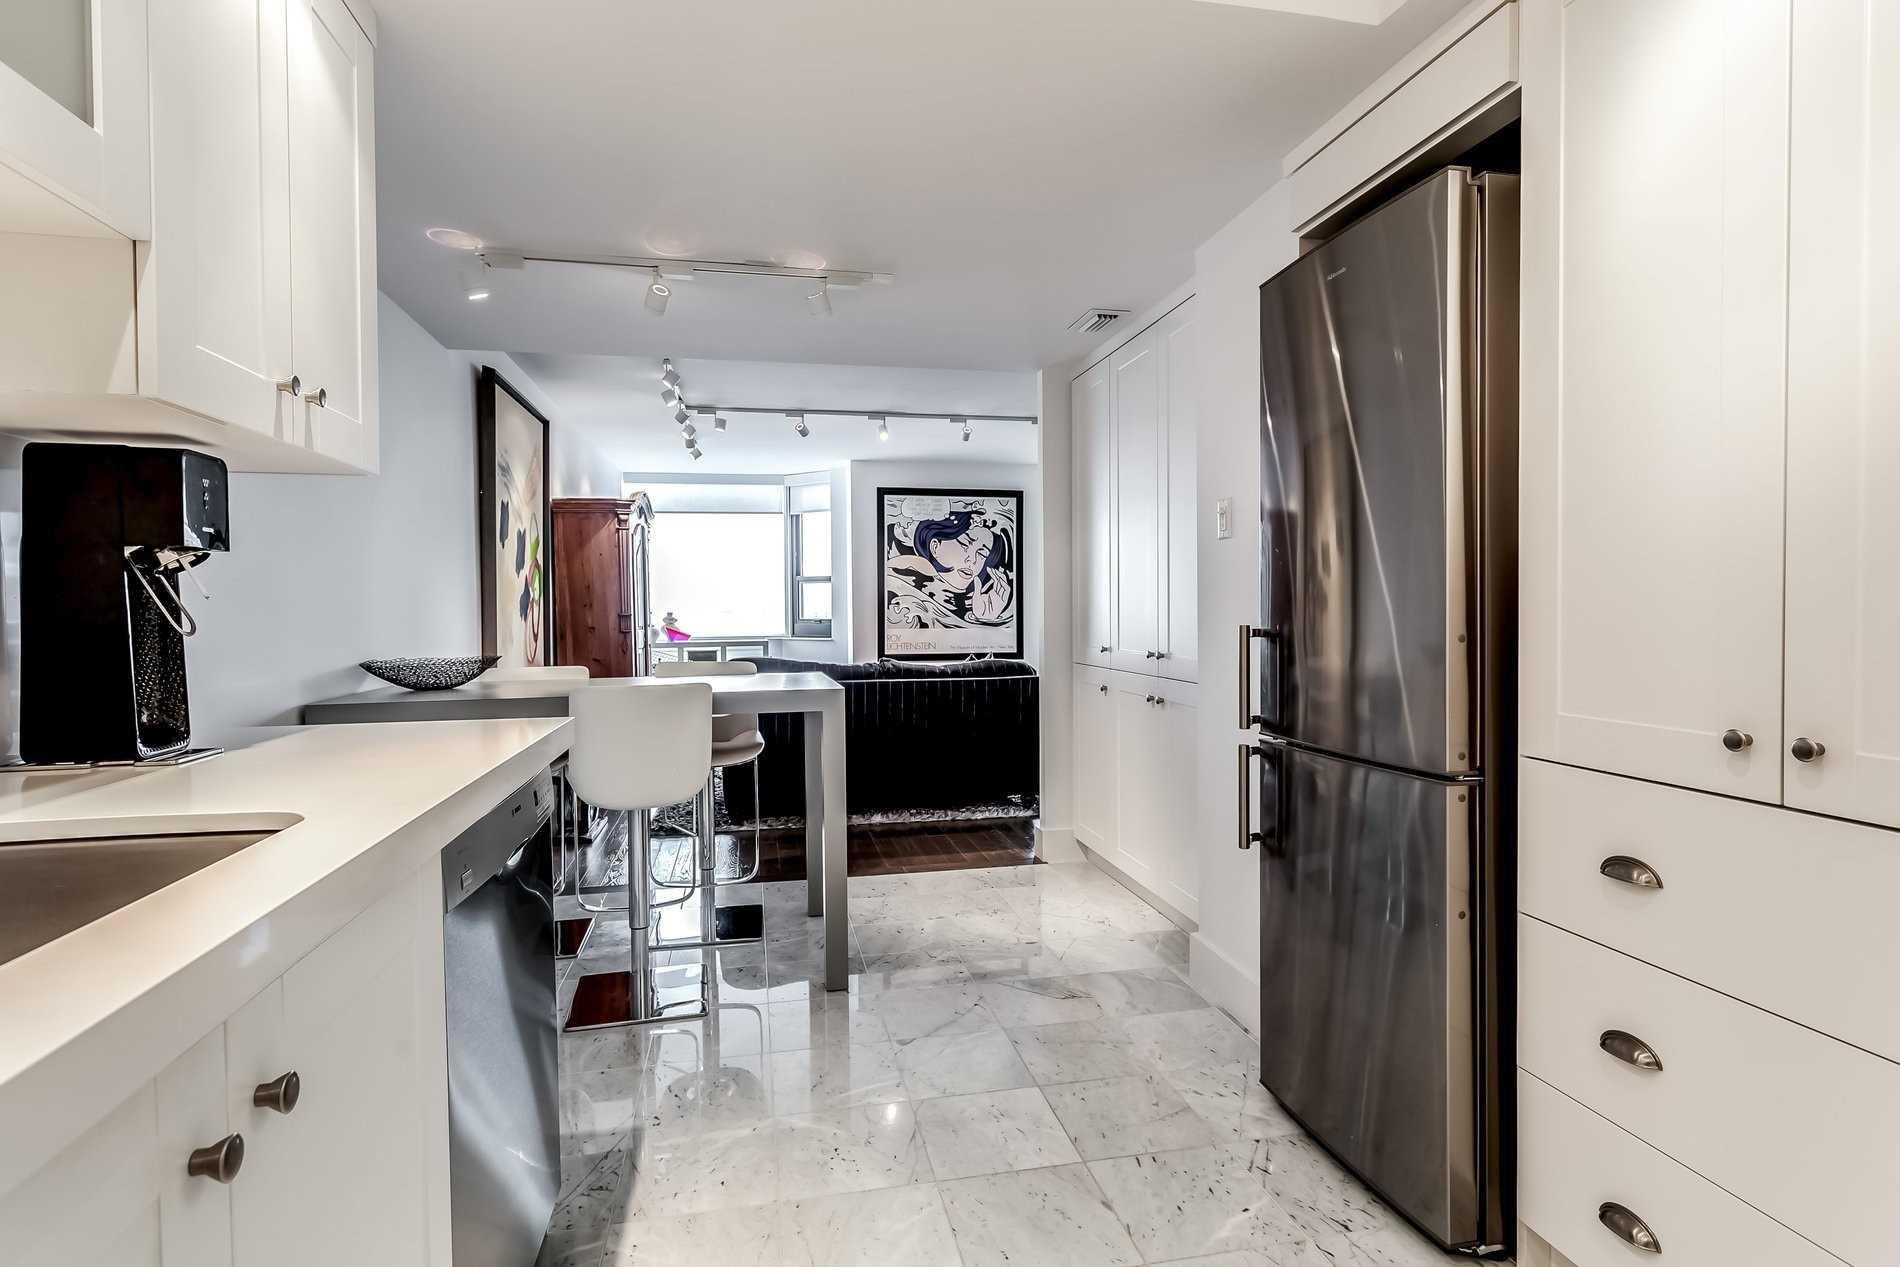 Condo Apt For Sale In Toronto , 2 Bedrooms Bedrooms, ,2 BathroomsBathrooms,Condo Apt,For Sale,2105,Bay